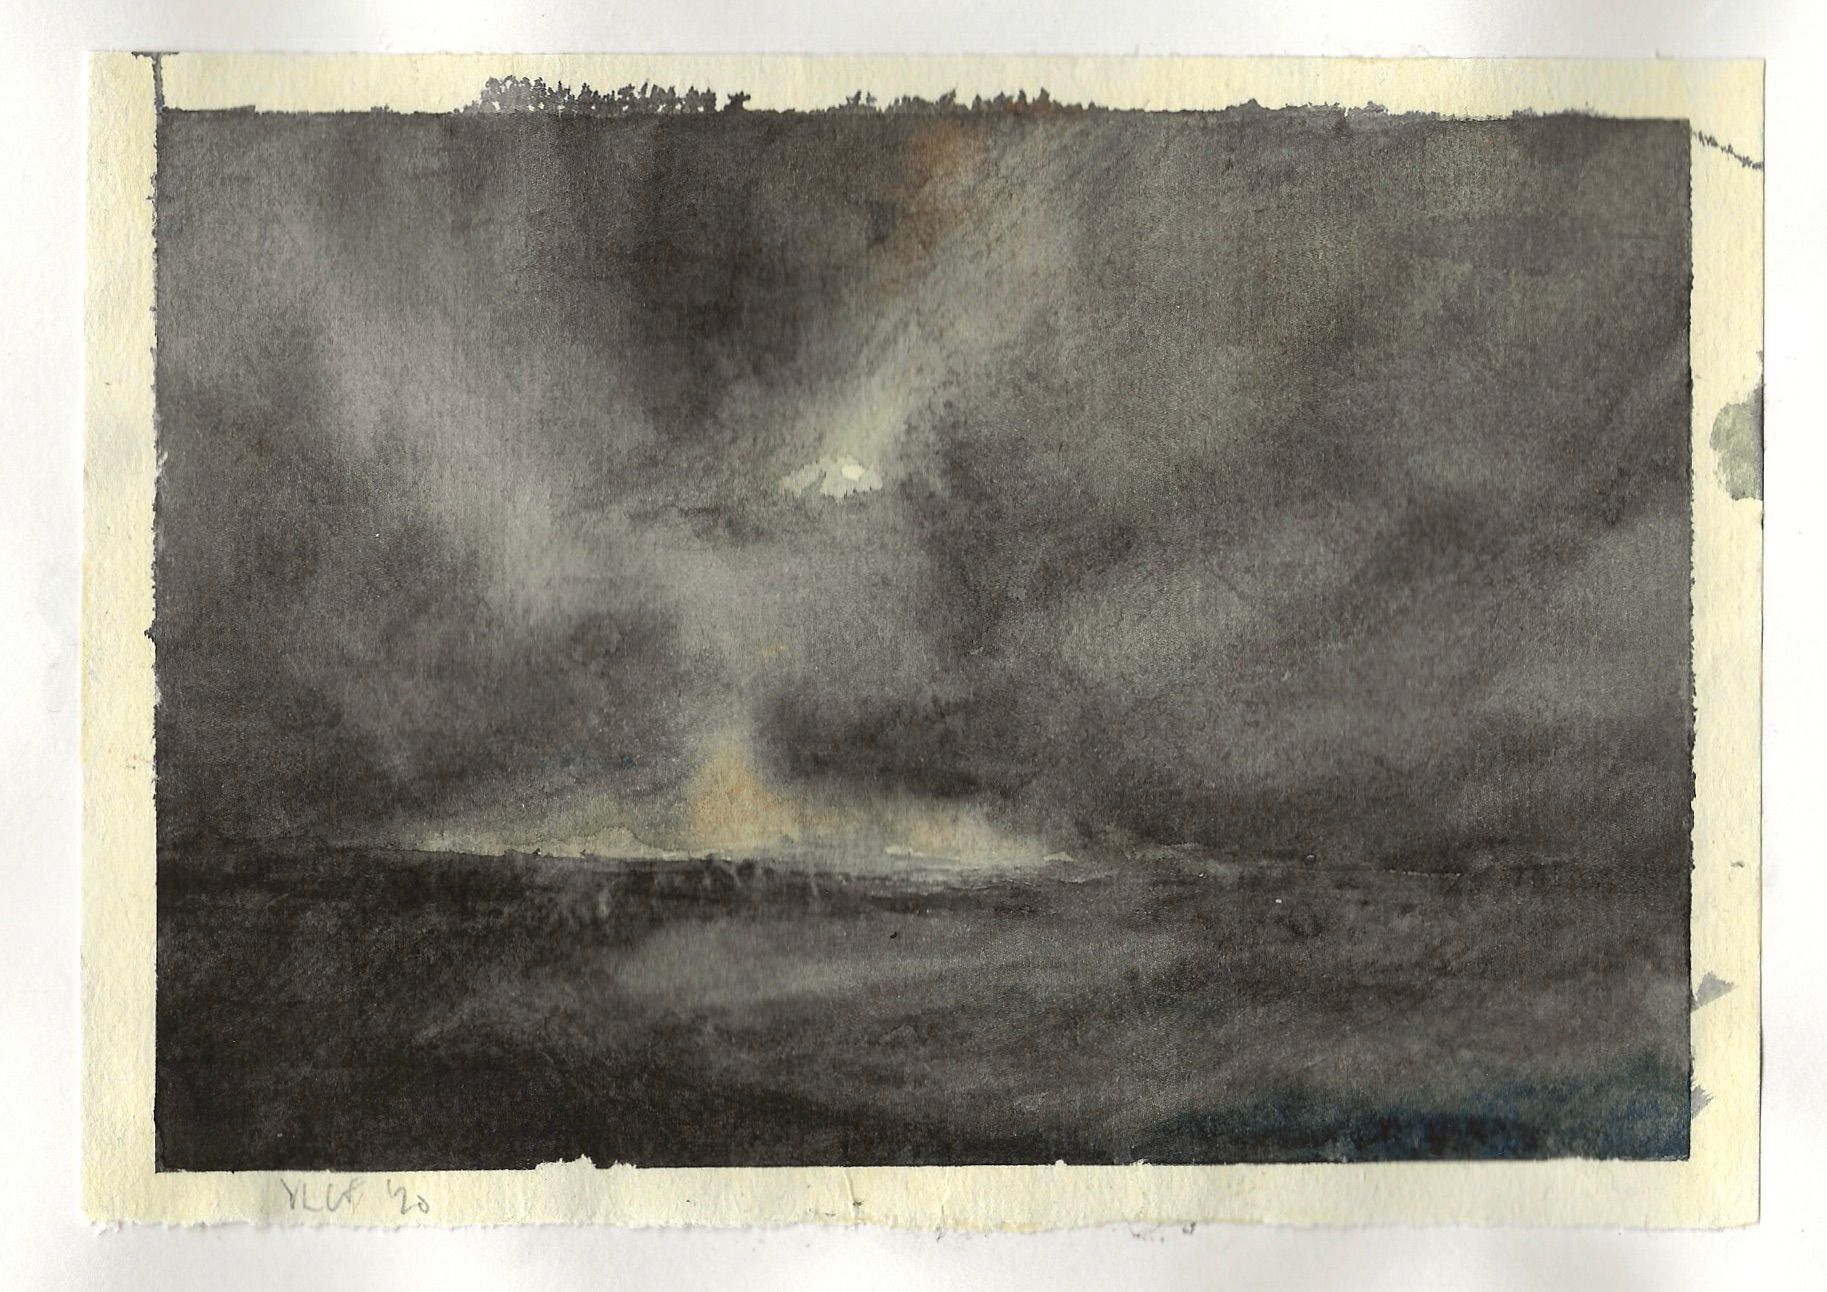 watercolour studies - #16 - watercolour - 210 x 148mm - 160gsm